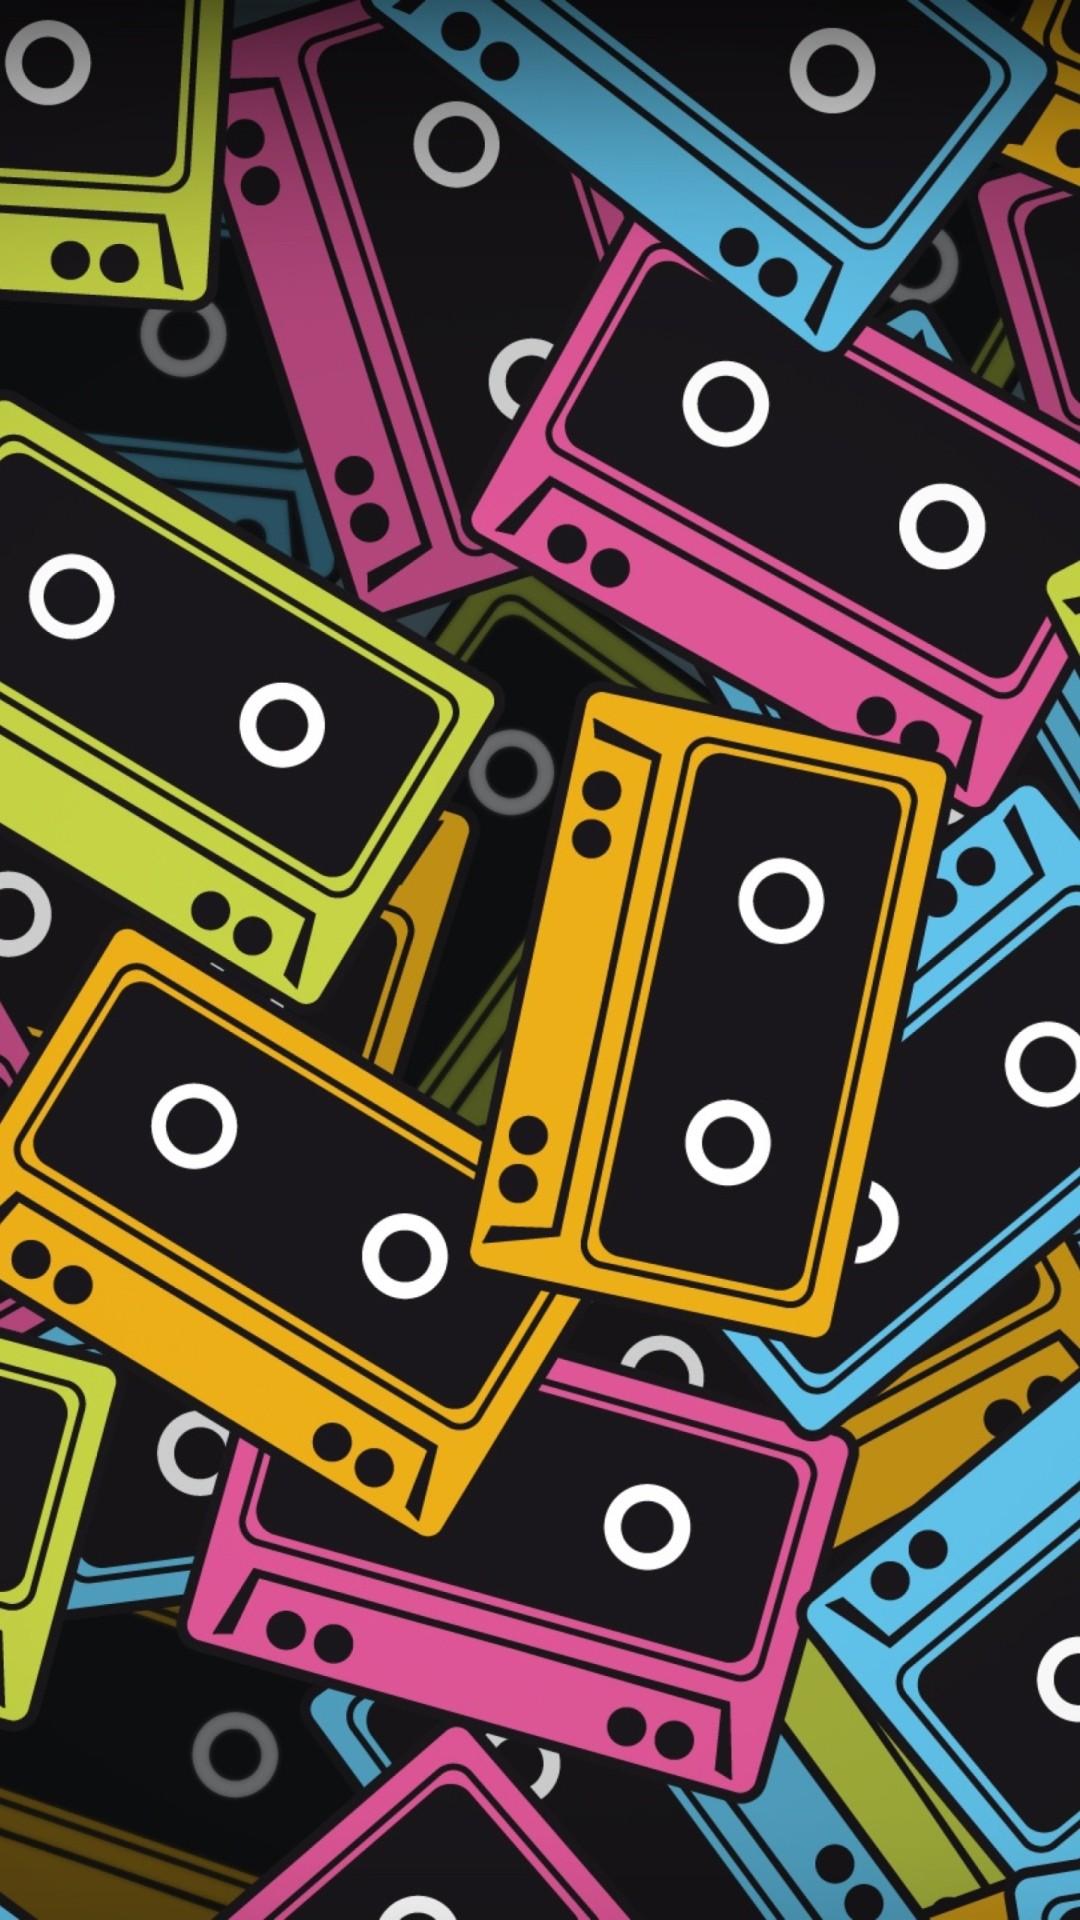 Retro iphone home screen wallpaper